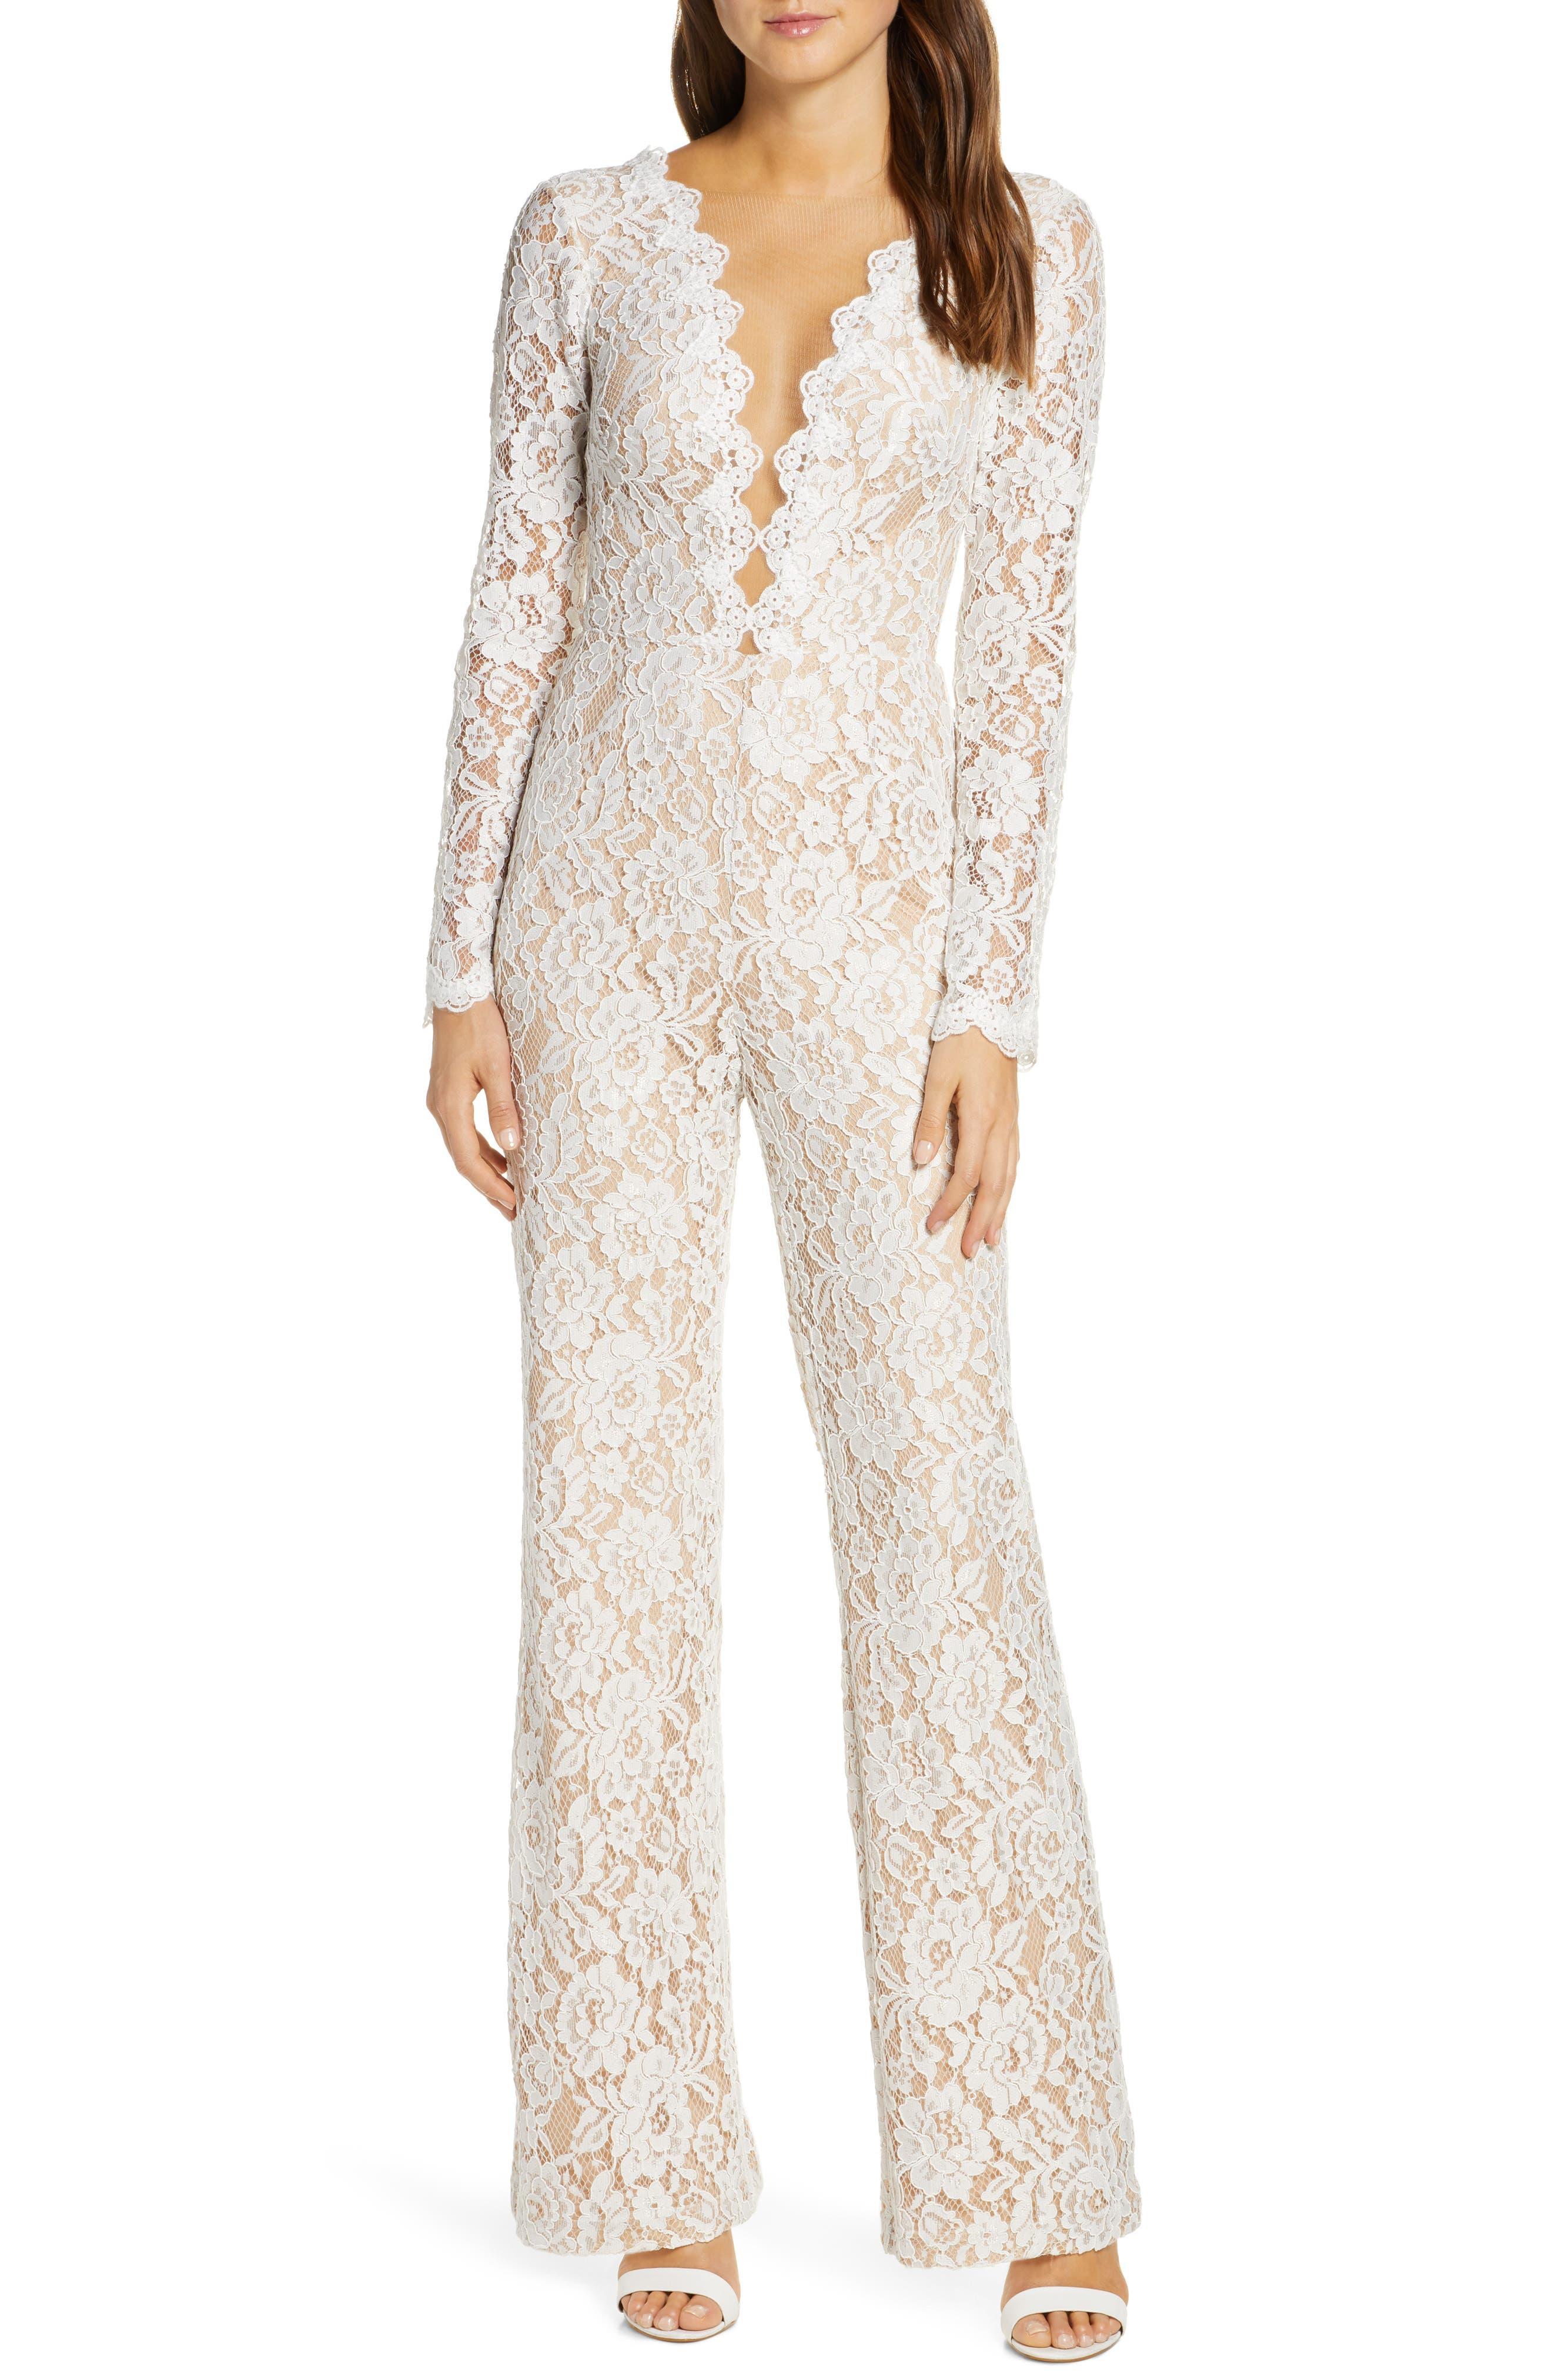 60s Wedding Dresses | 70s Wedding Dresses Womens Tadashi Shoji Long Sleeve Lace Wedding Jumpsuit $498.00 AT vintagedancer.com